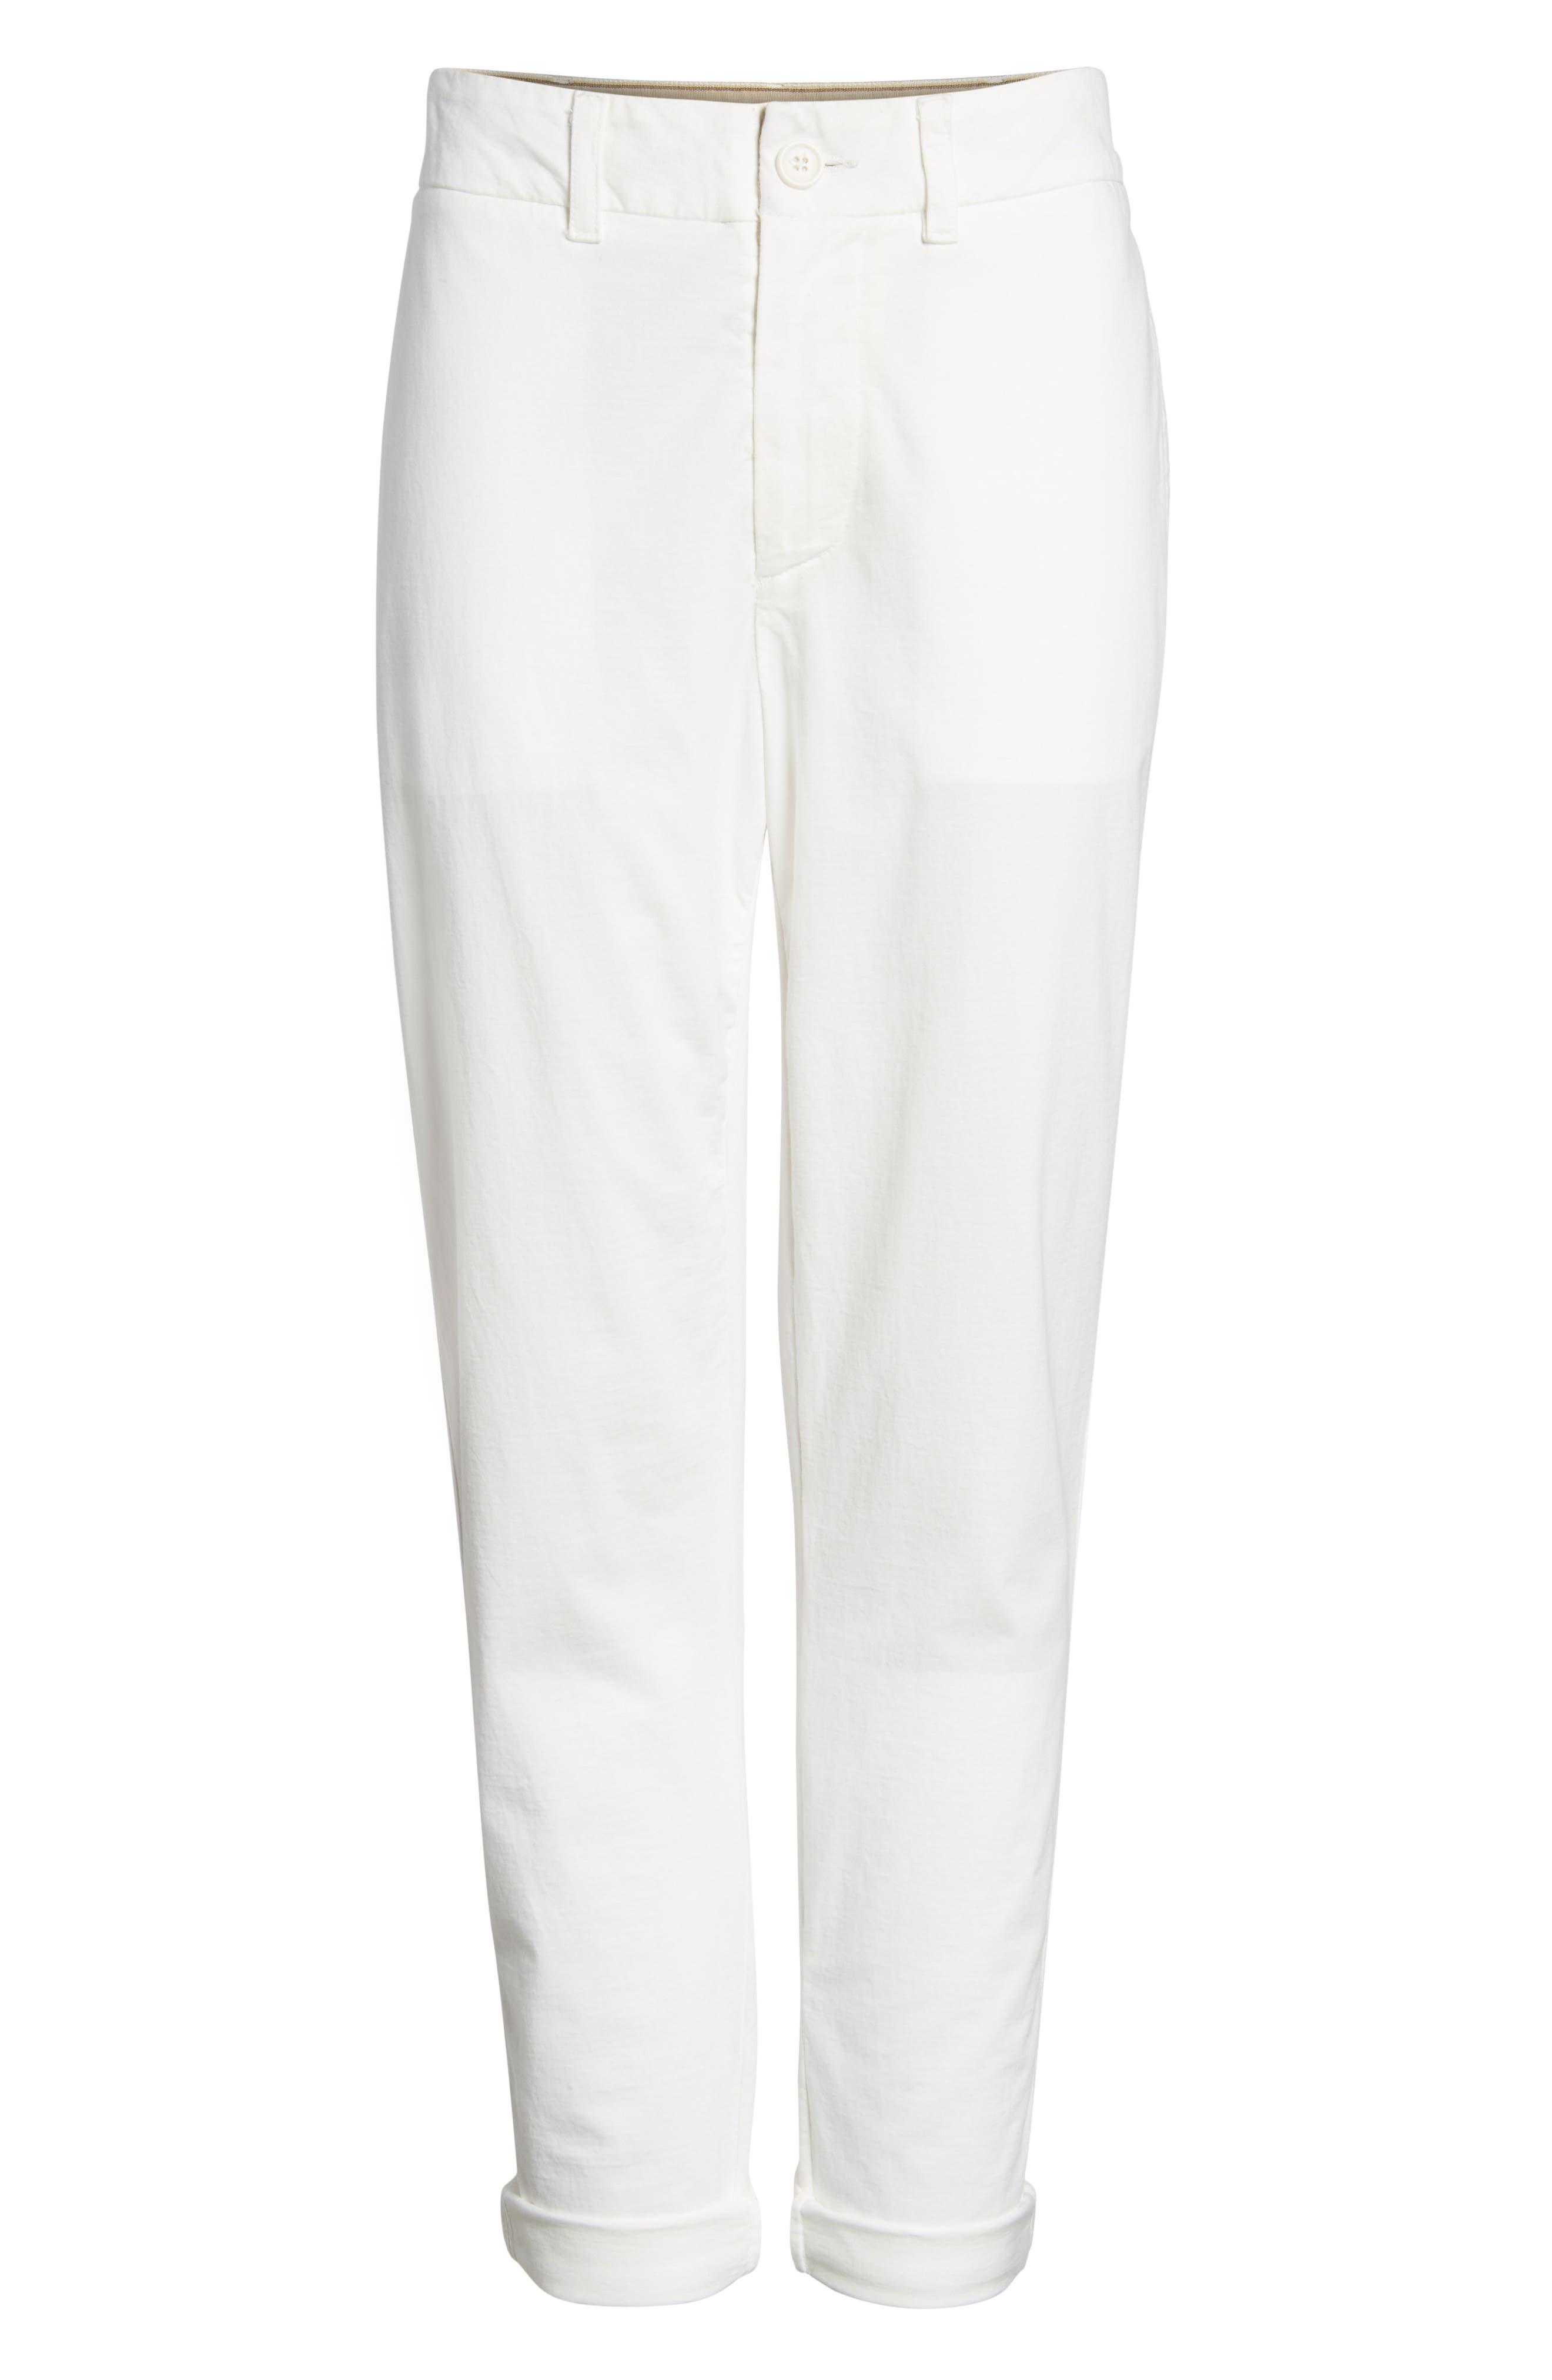 Full Surplus Jersey Pants,                             Alternate thumbnail 7, color,                             White